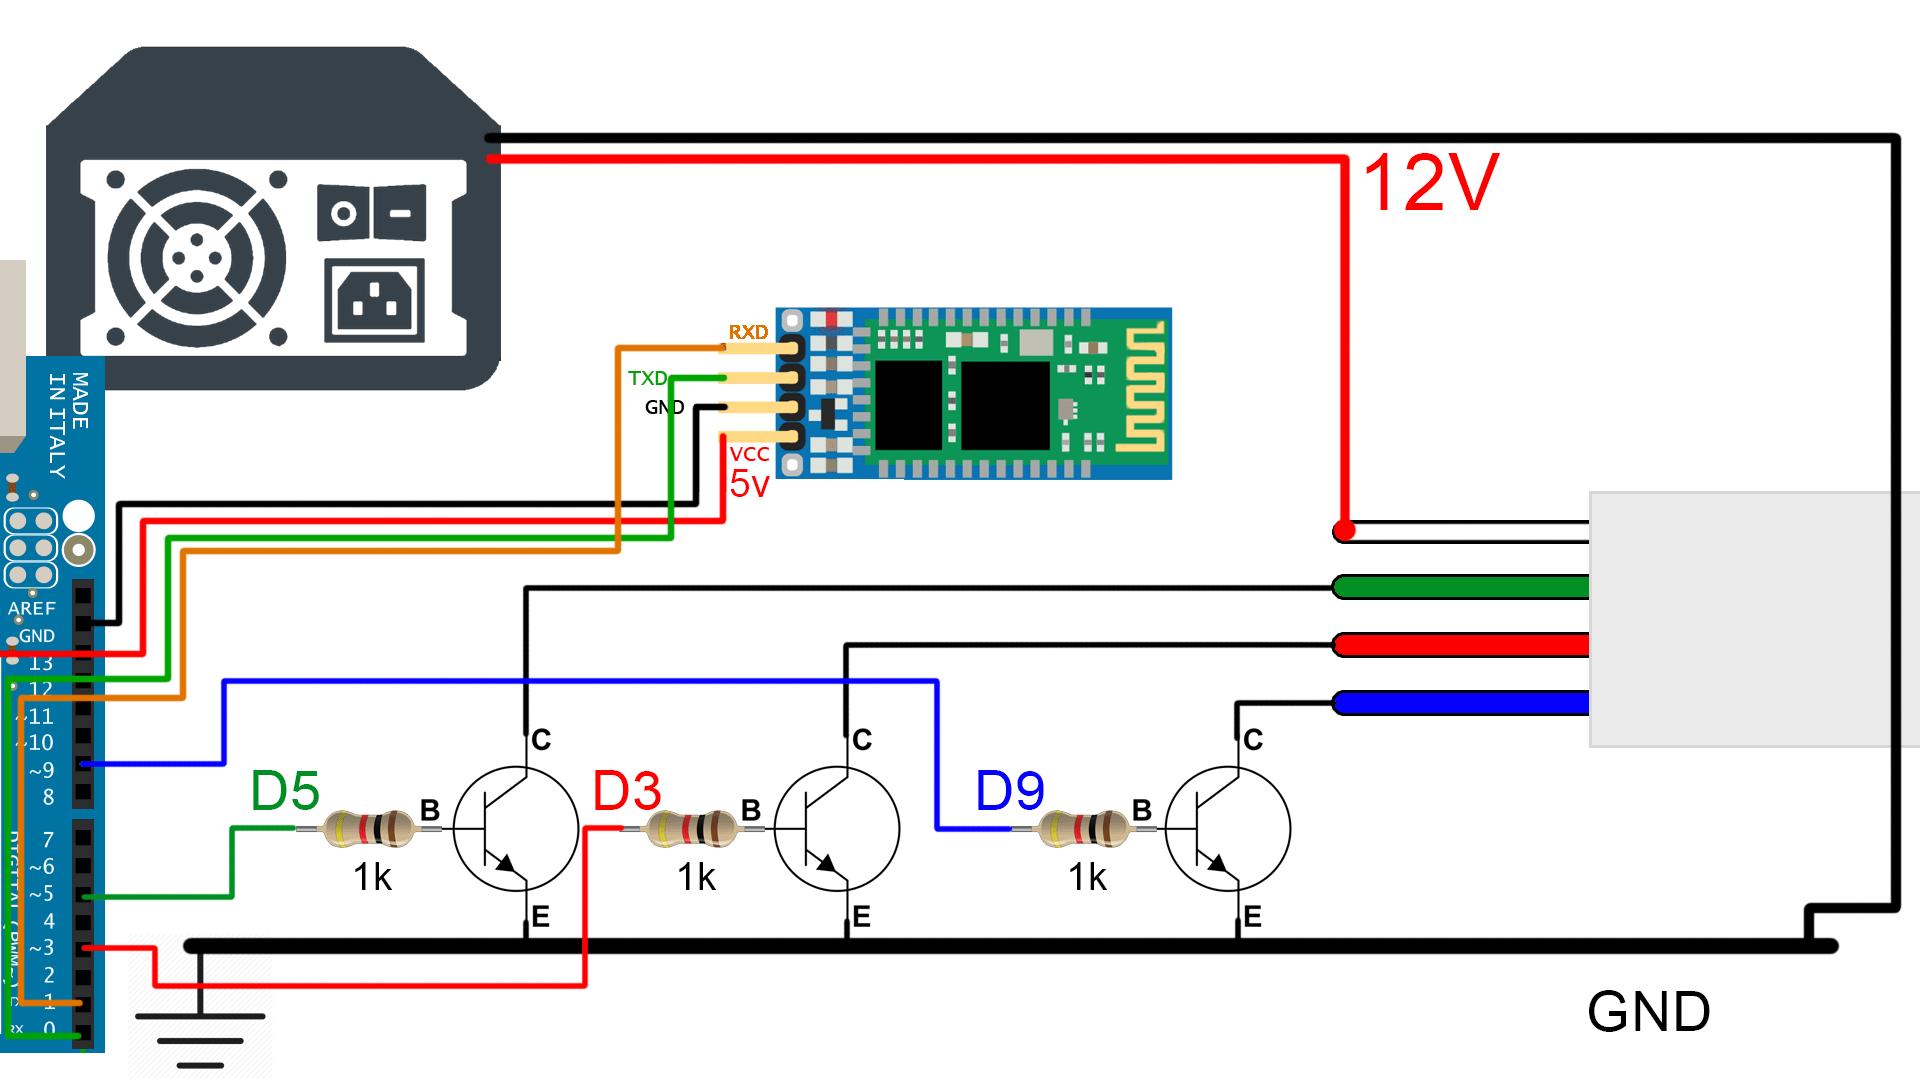 hight resolution of 12v addressable led wiring diagram wiring library 12v addressable led wiring diagram